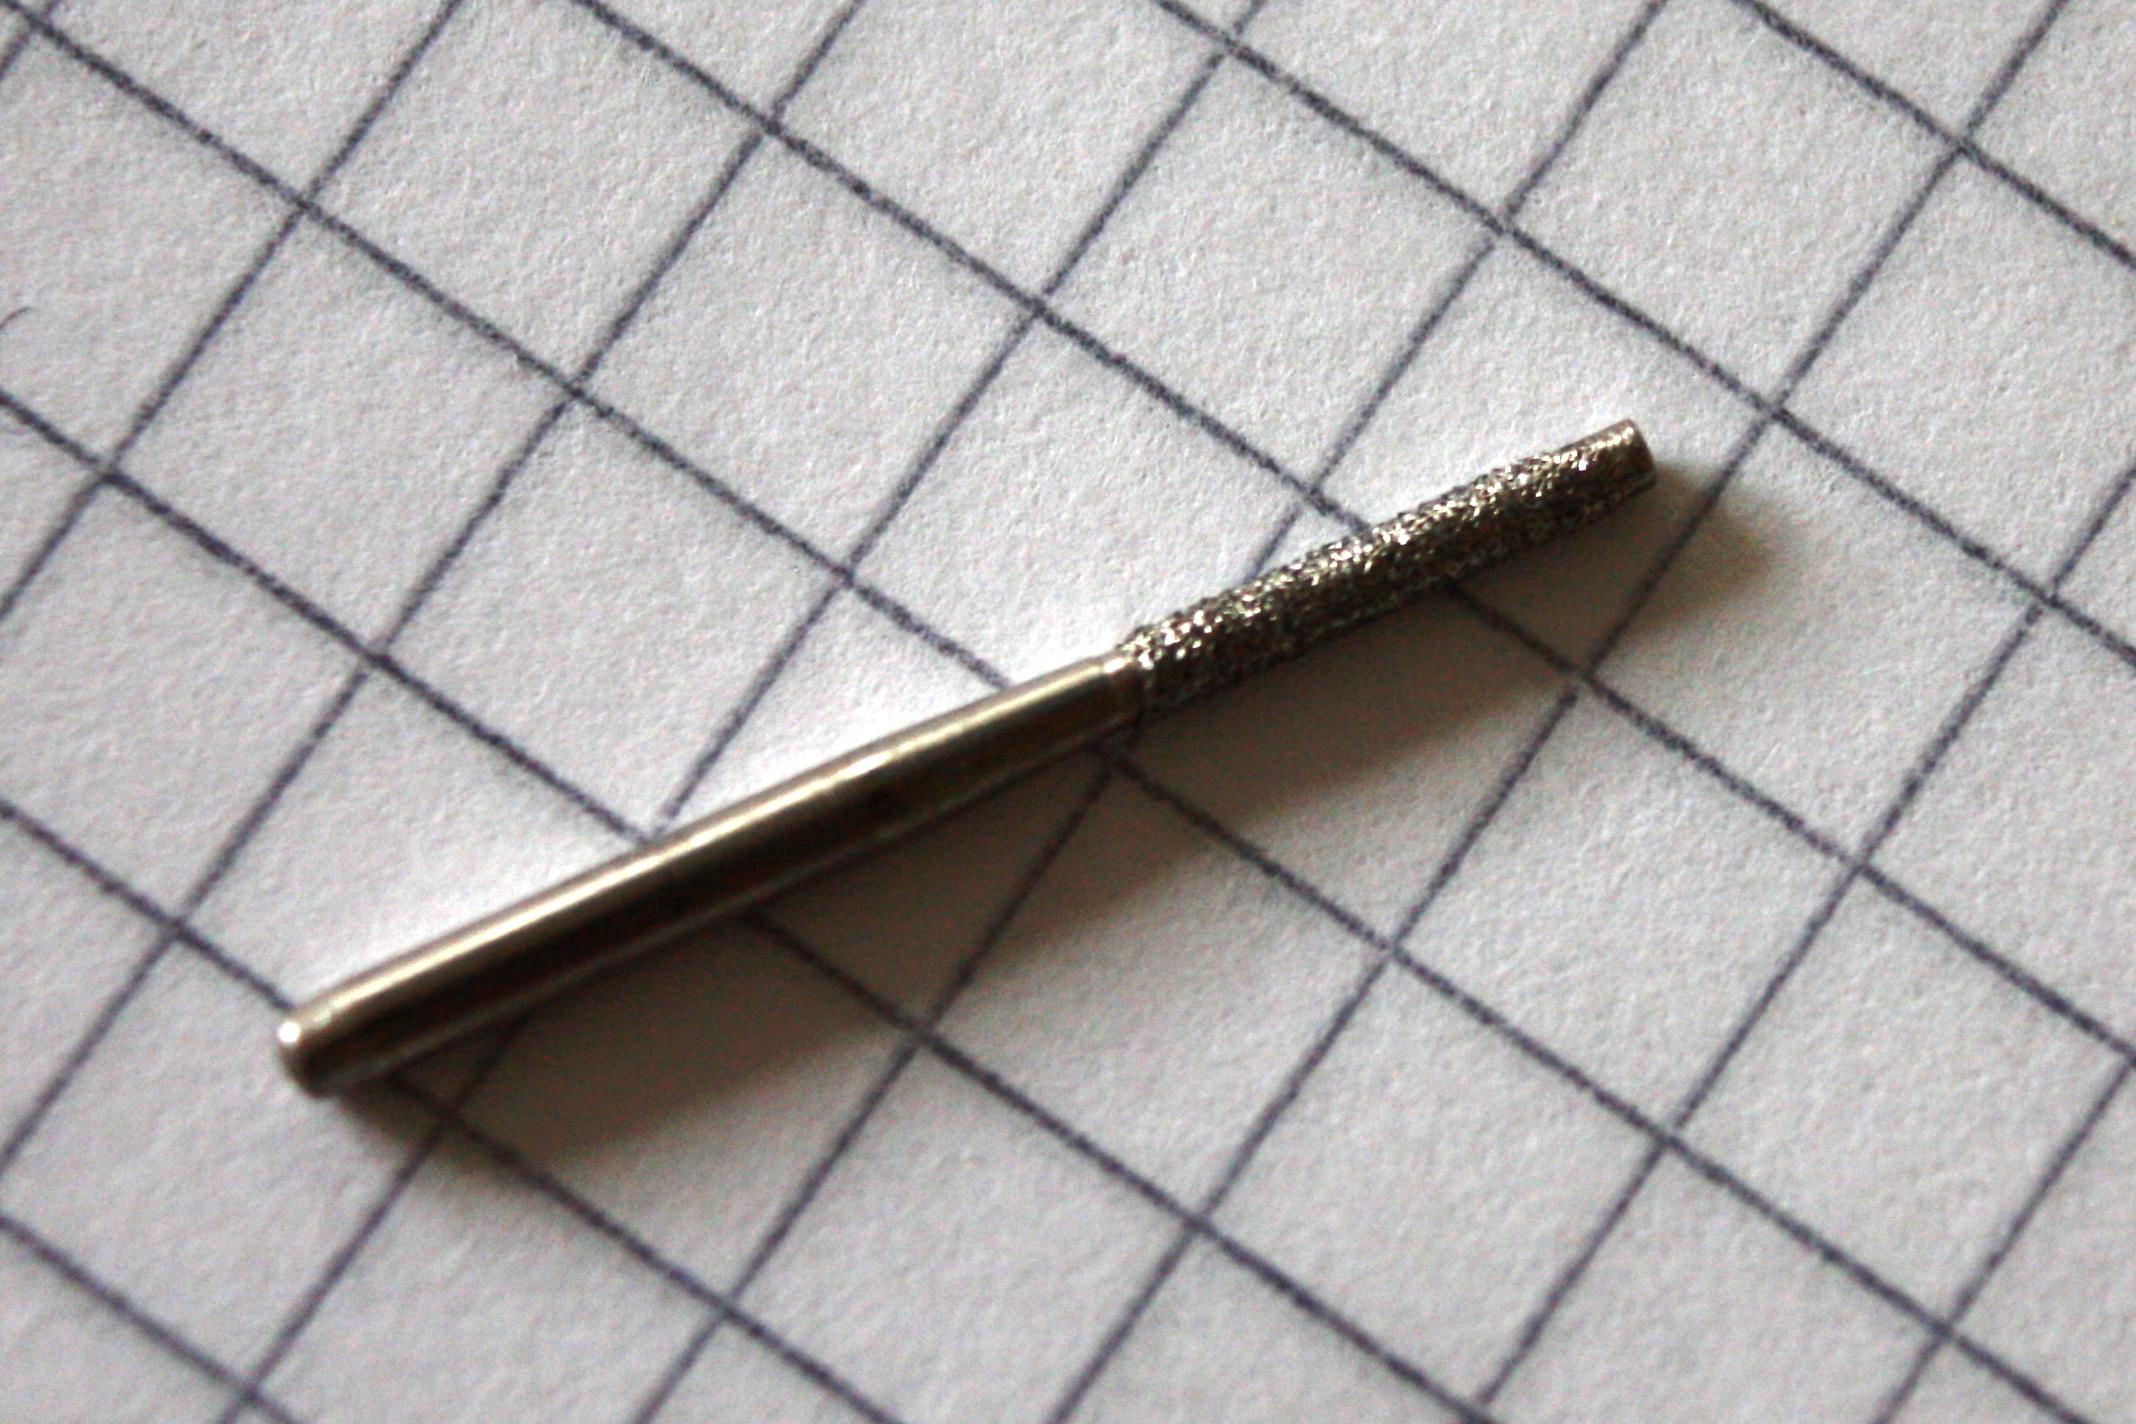 File:Diamantbohrer abgenutzt 20090930 01.JPG - Wikimedia Commons